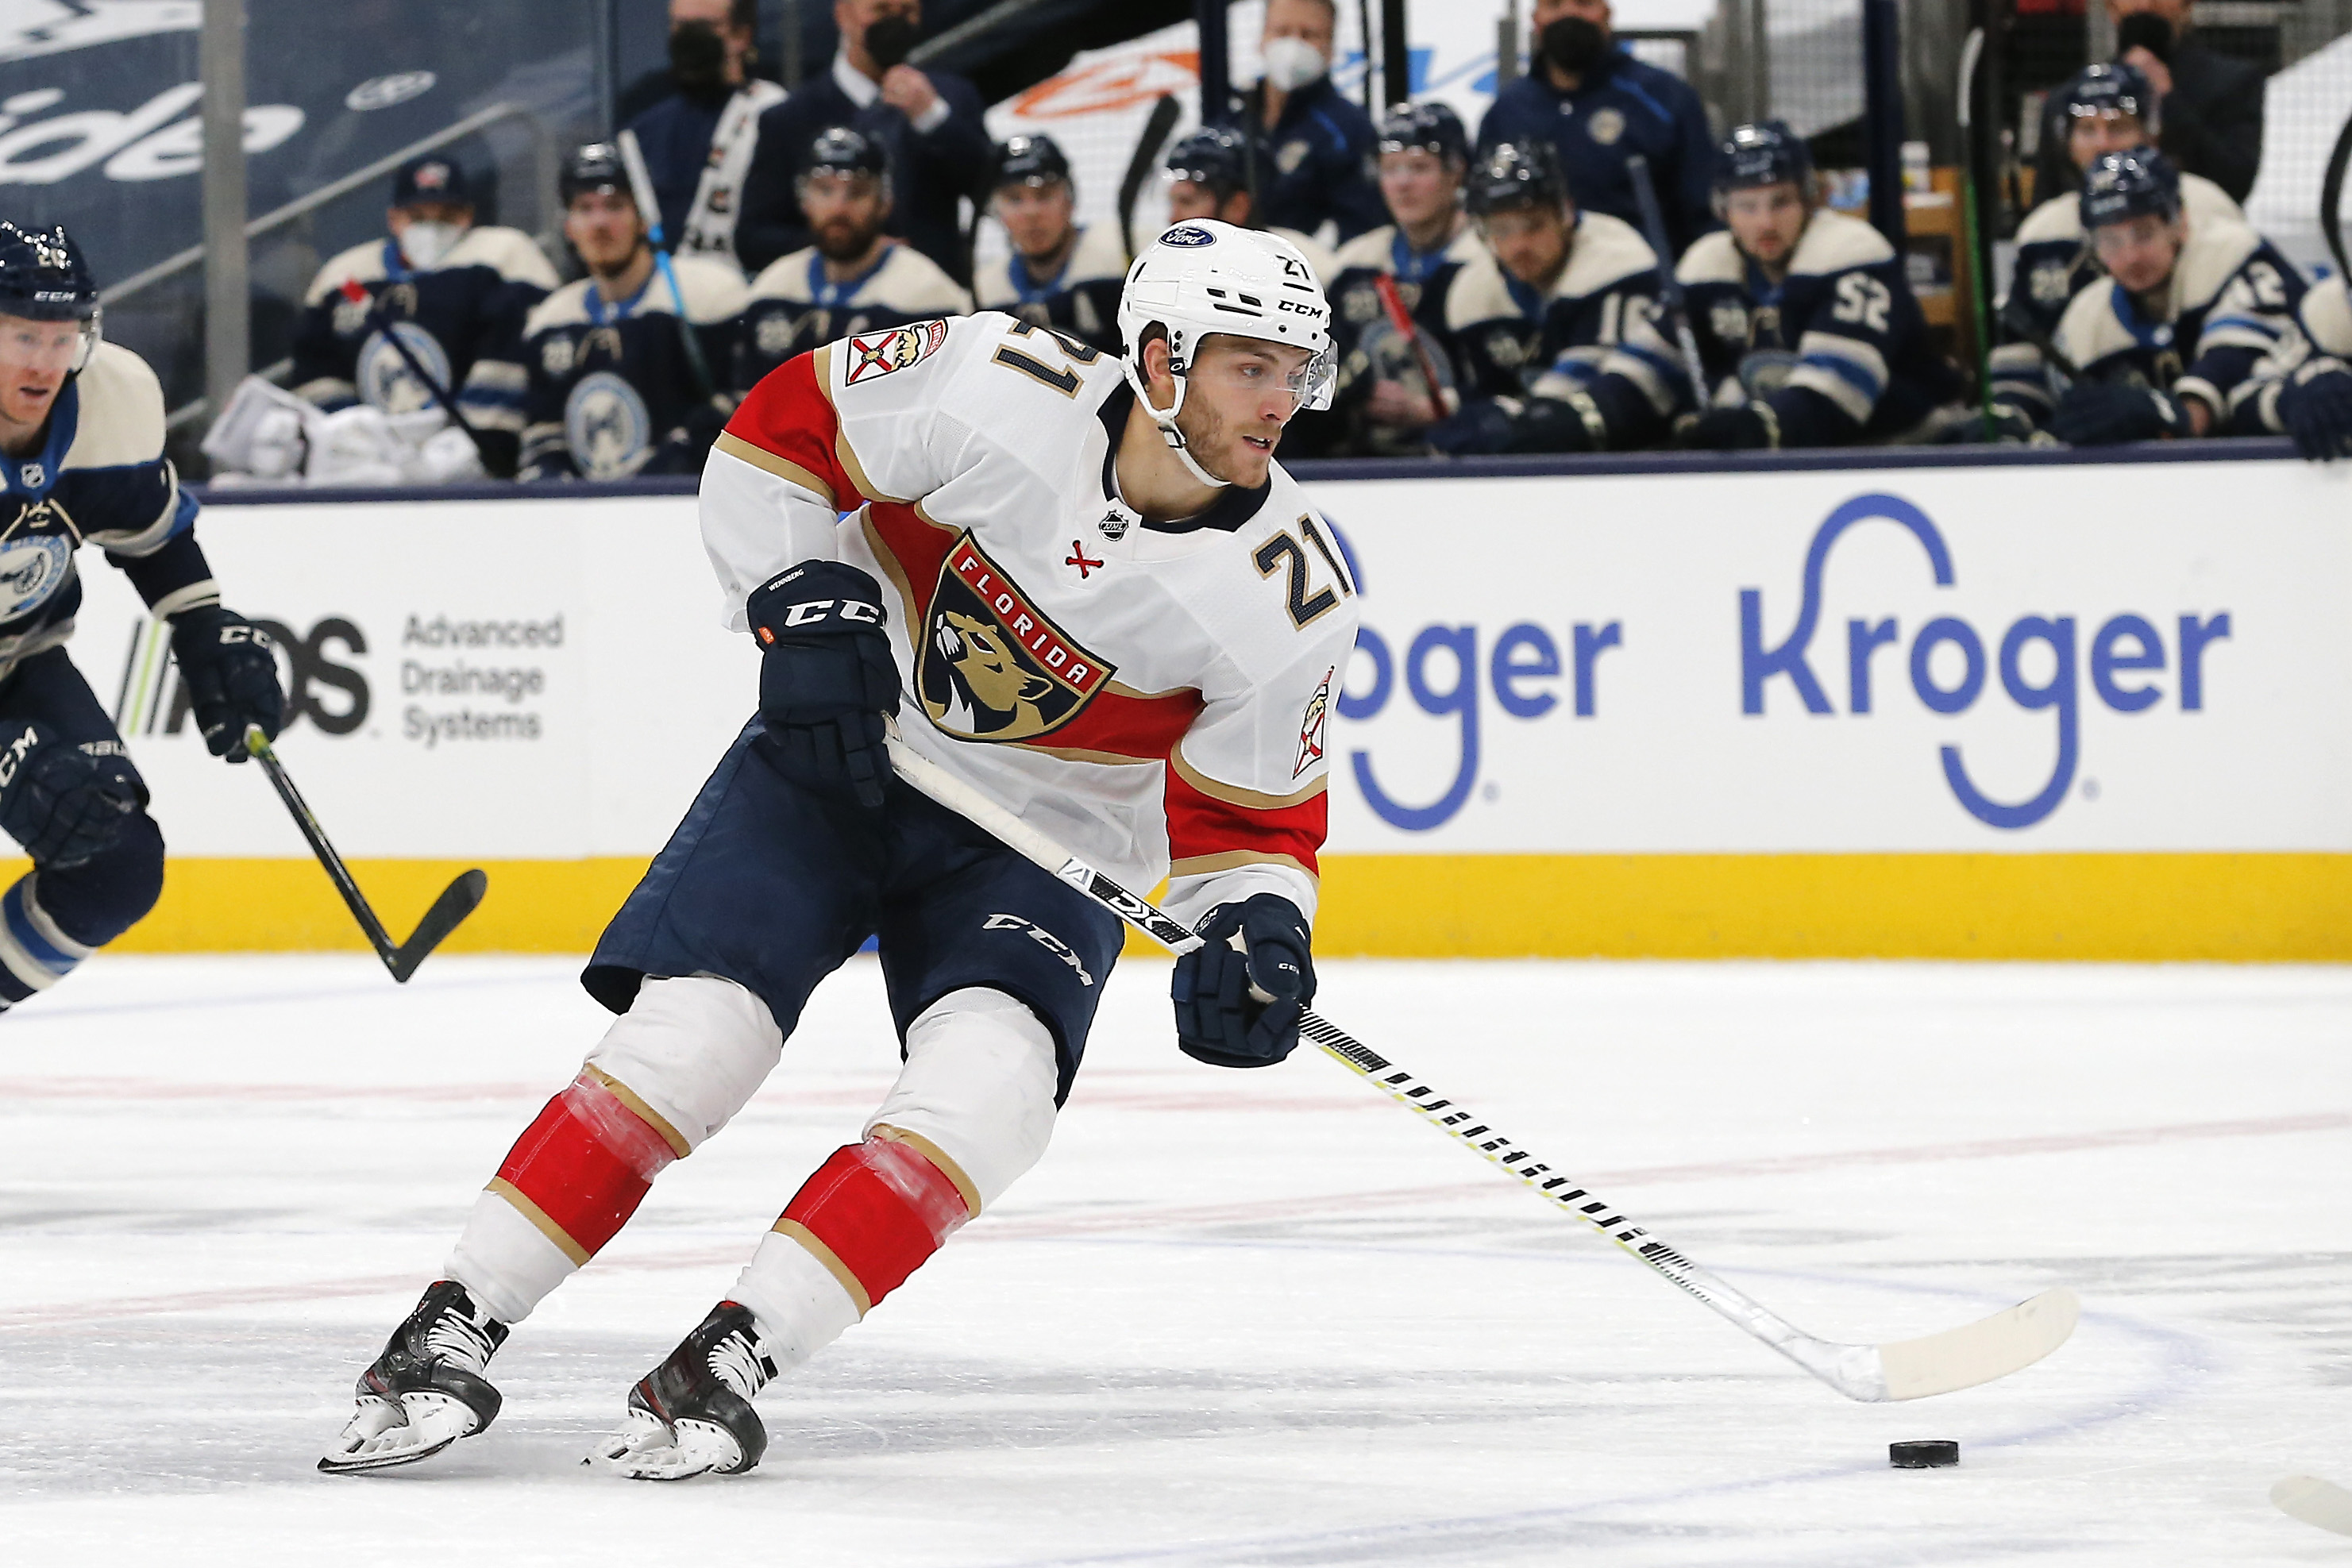 Alexander Wennberg notches second career NHL hat trick